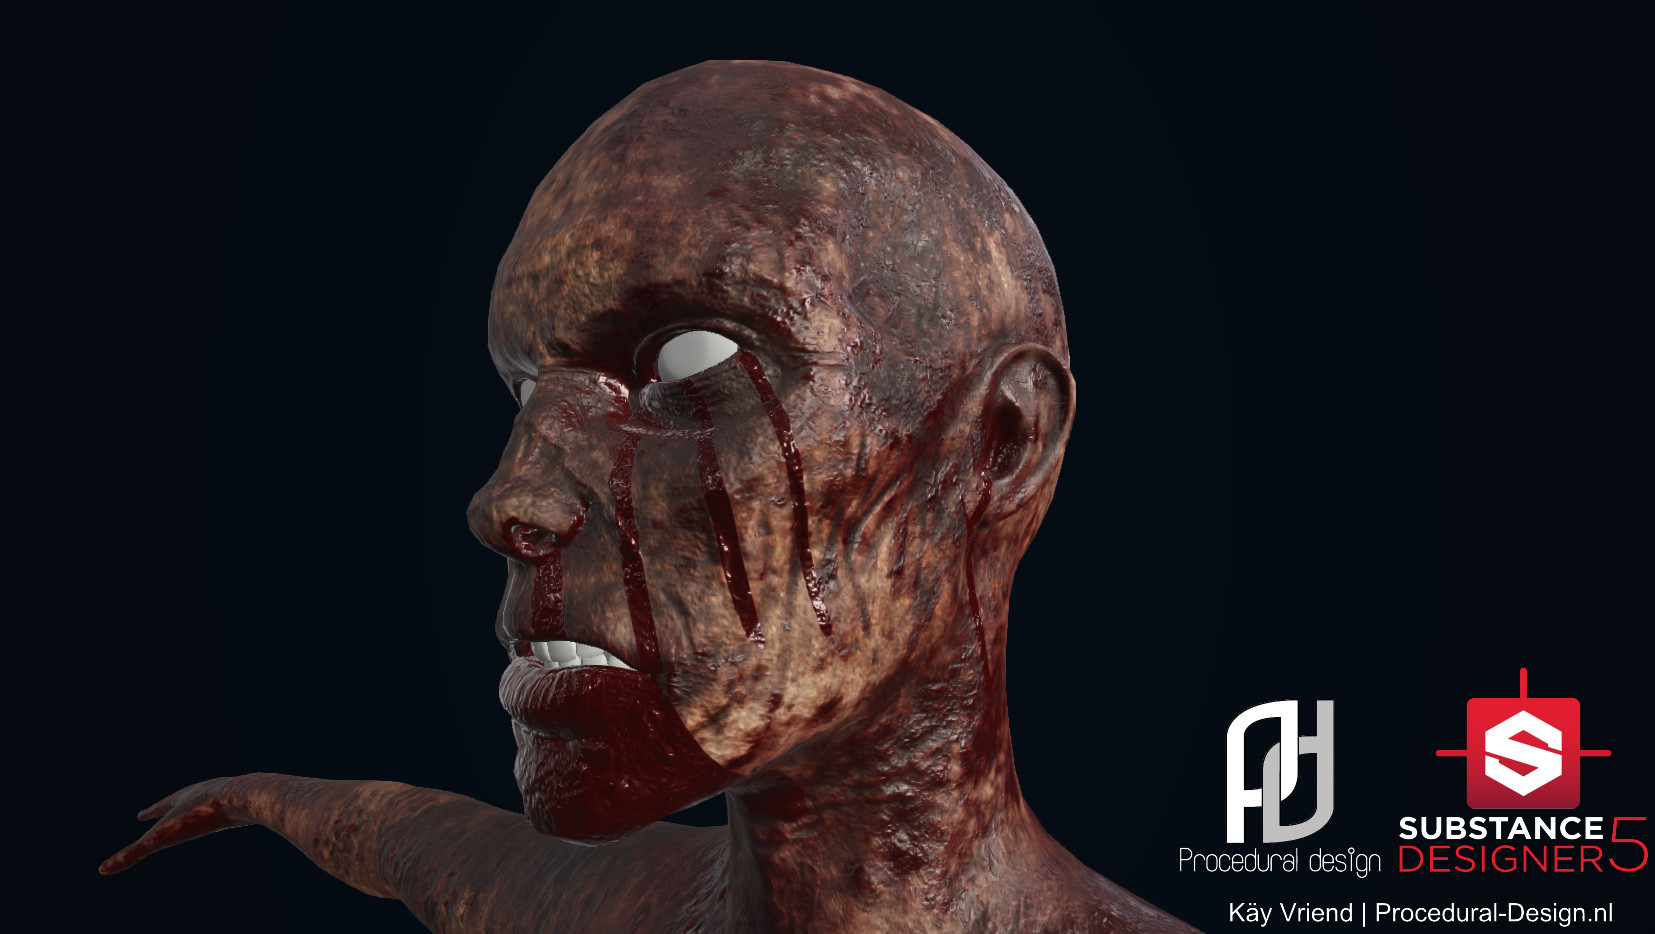 Kay vriend zombie 21